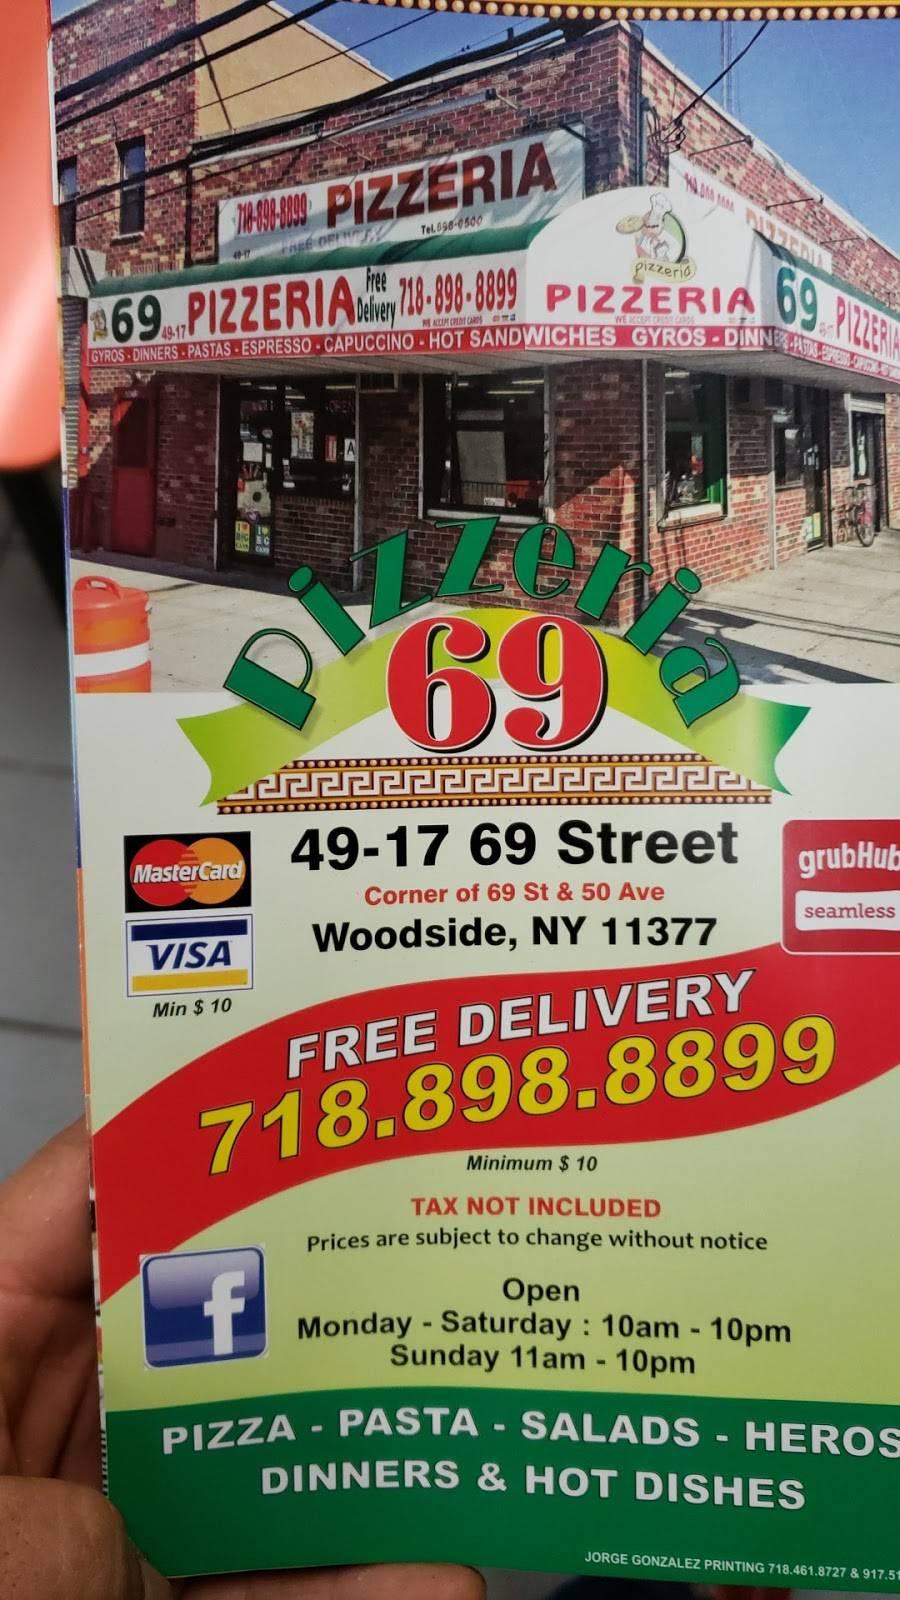 69 Pizzeria   restaurant   4917 69th St, Woodside, NY 11377, USA   7188988899 OR +1 718-898-8899